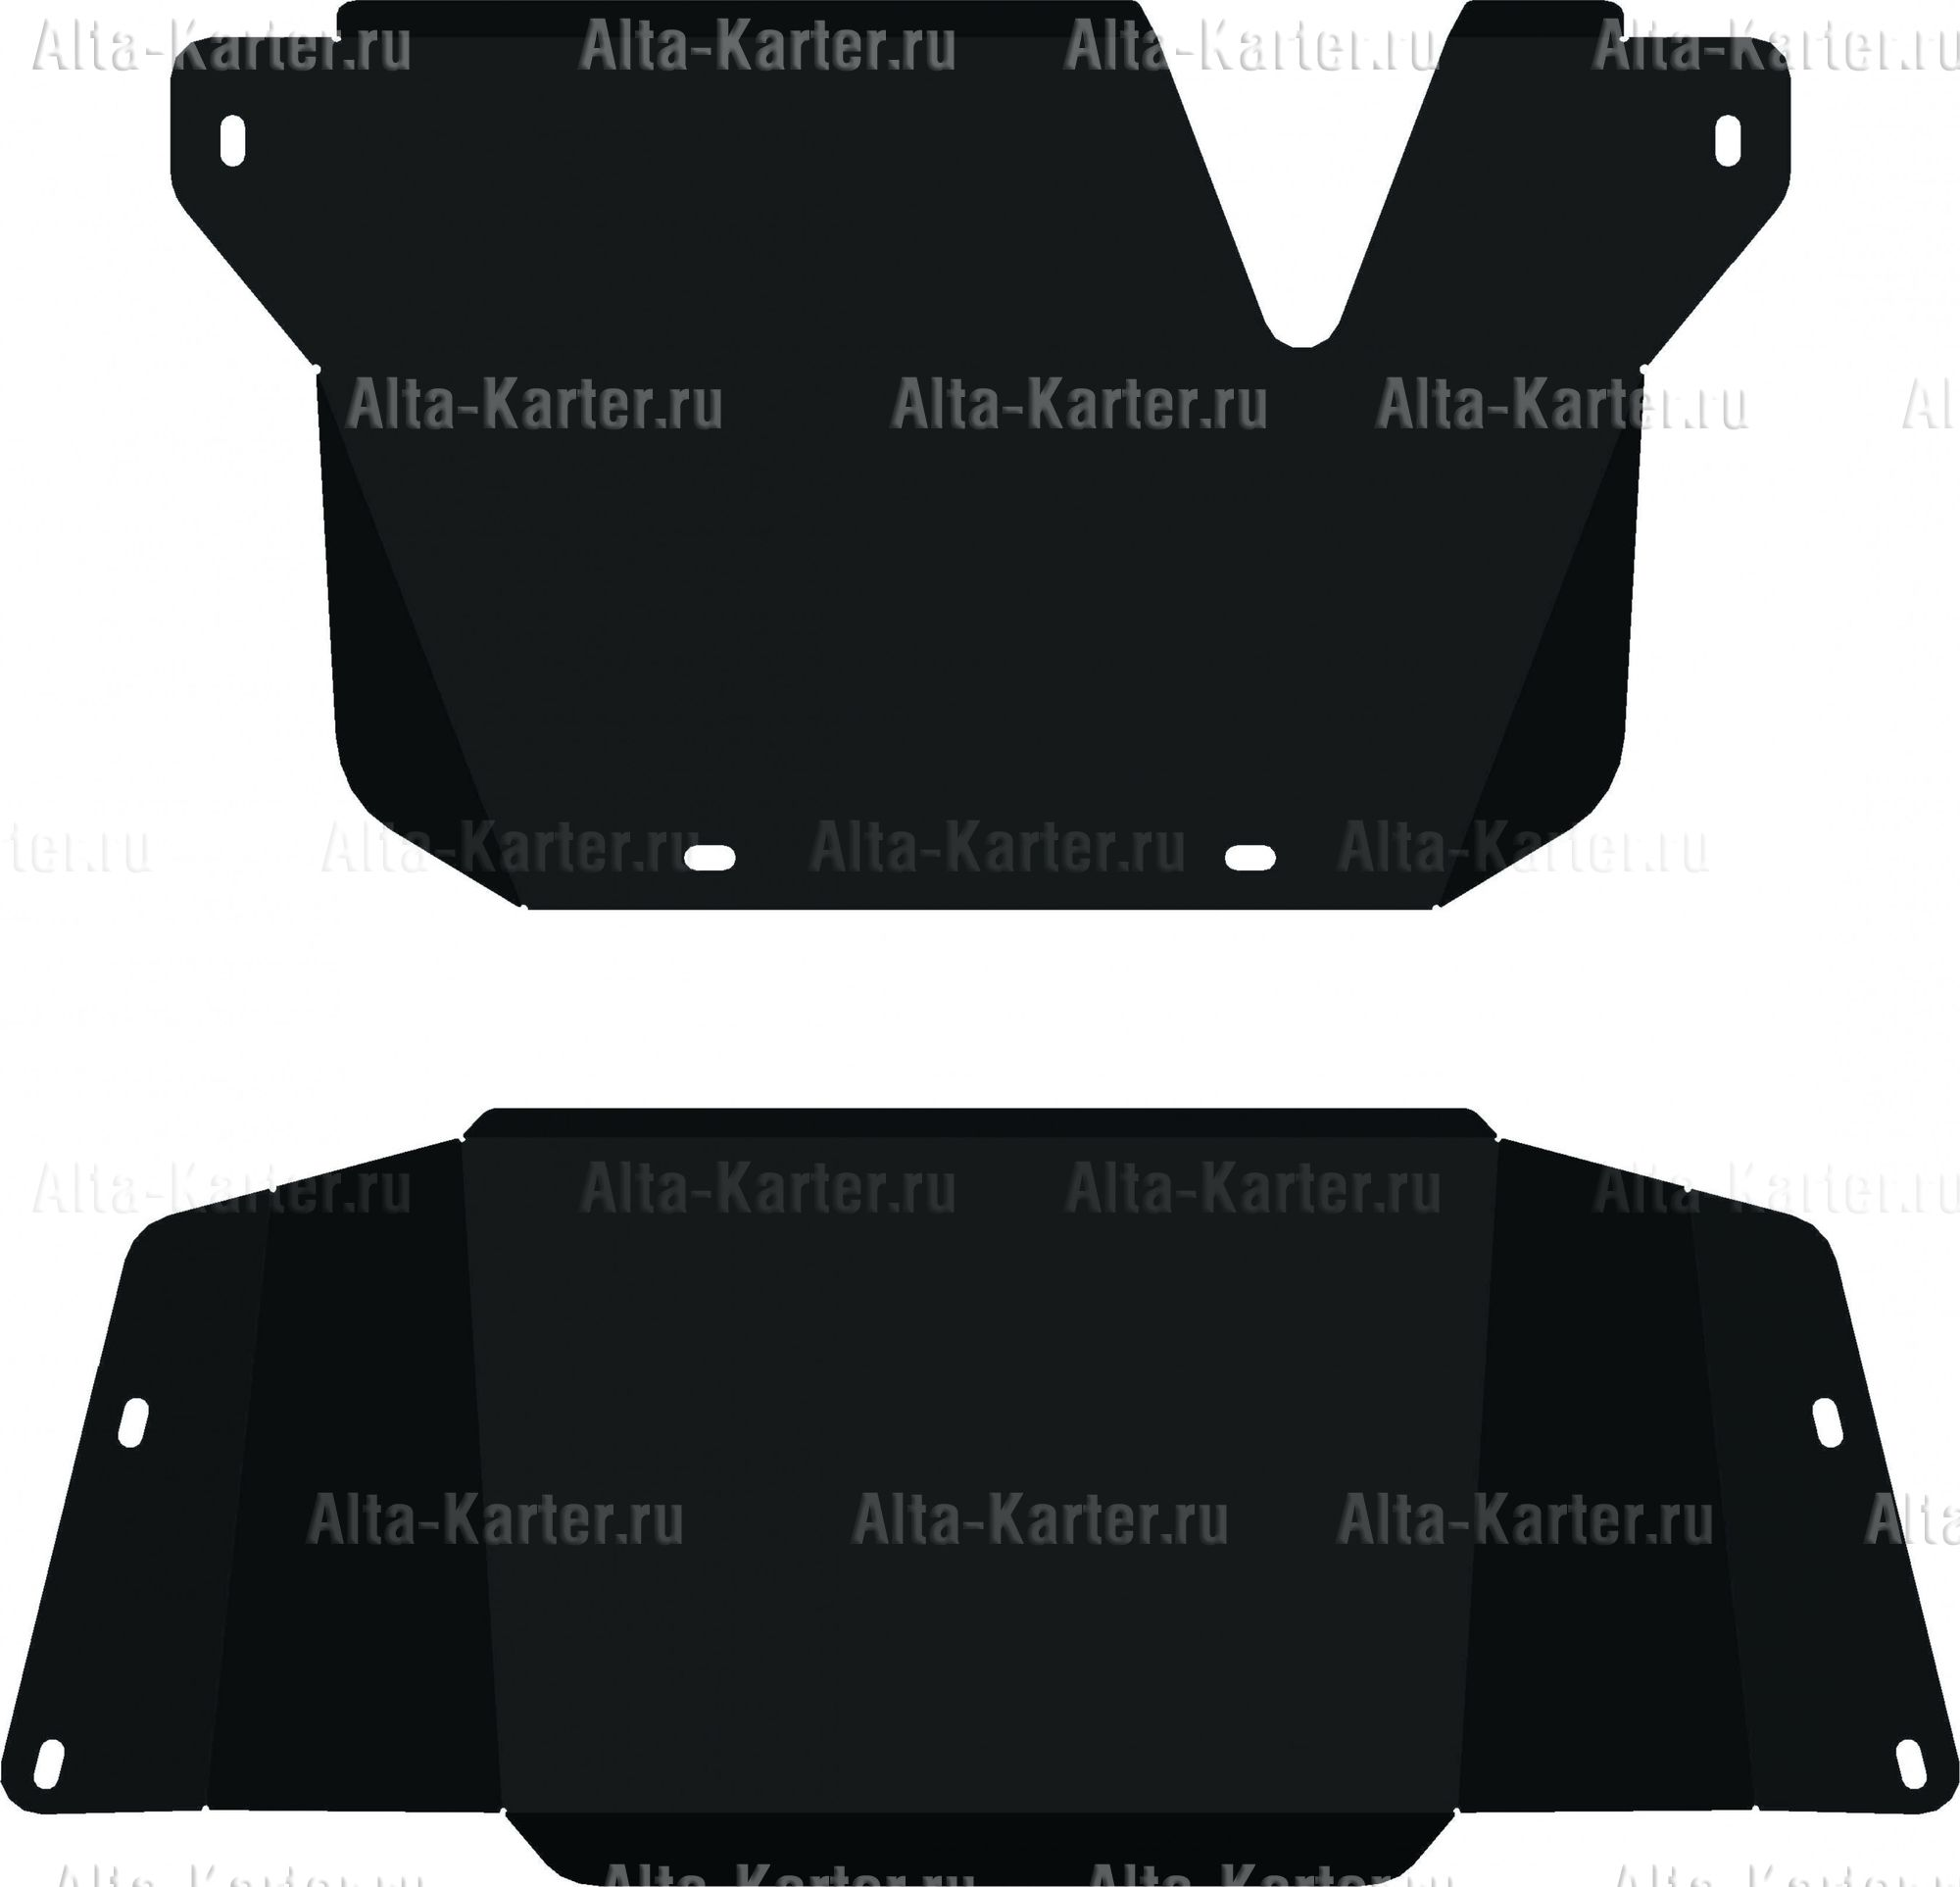 Защита Alfeco для КПП и РК Toyota Land Cruiser 105 2002-2007. Артикул ALF.24.83